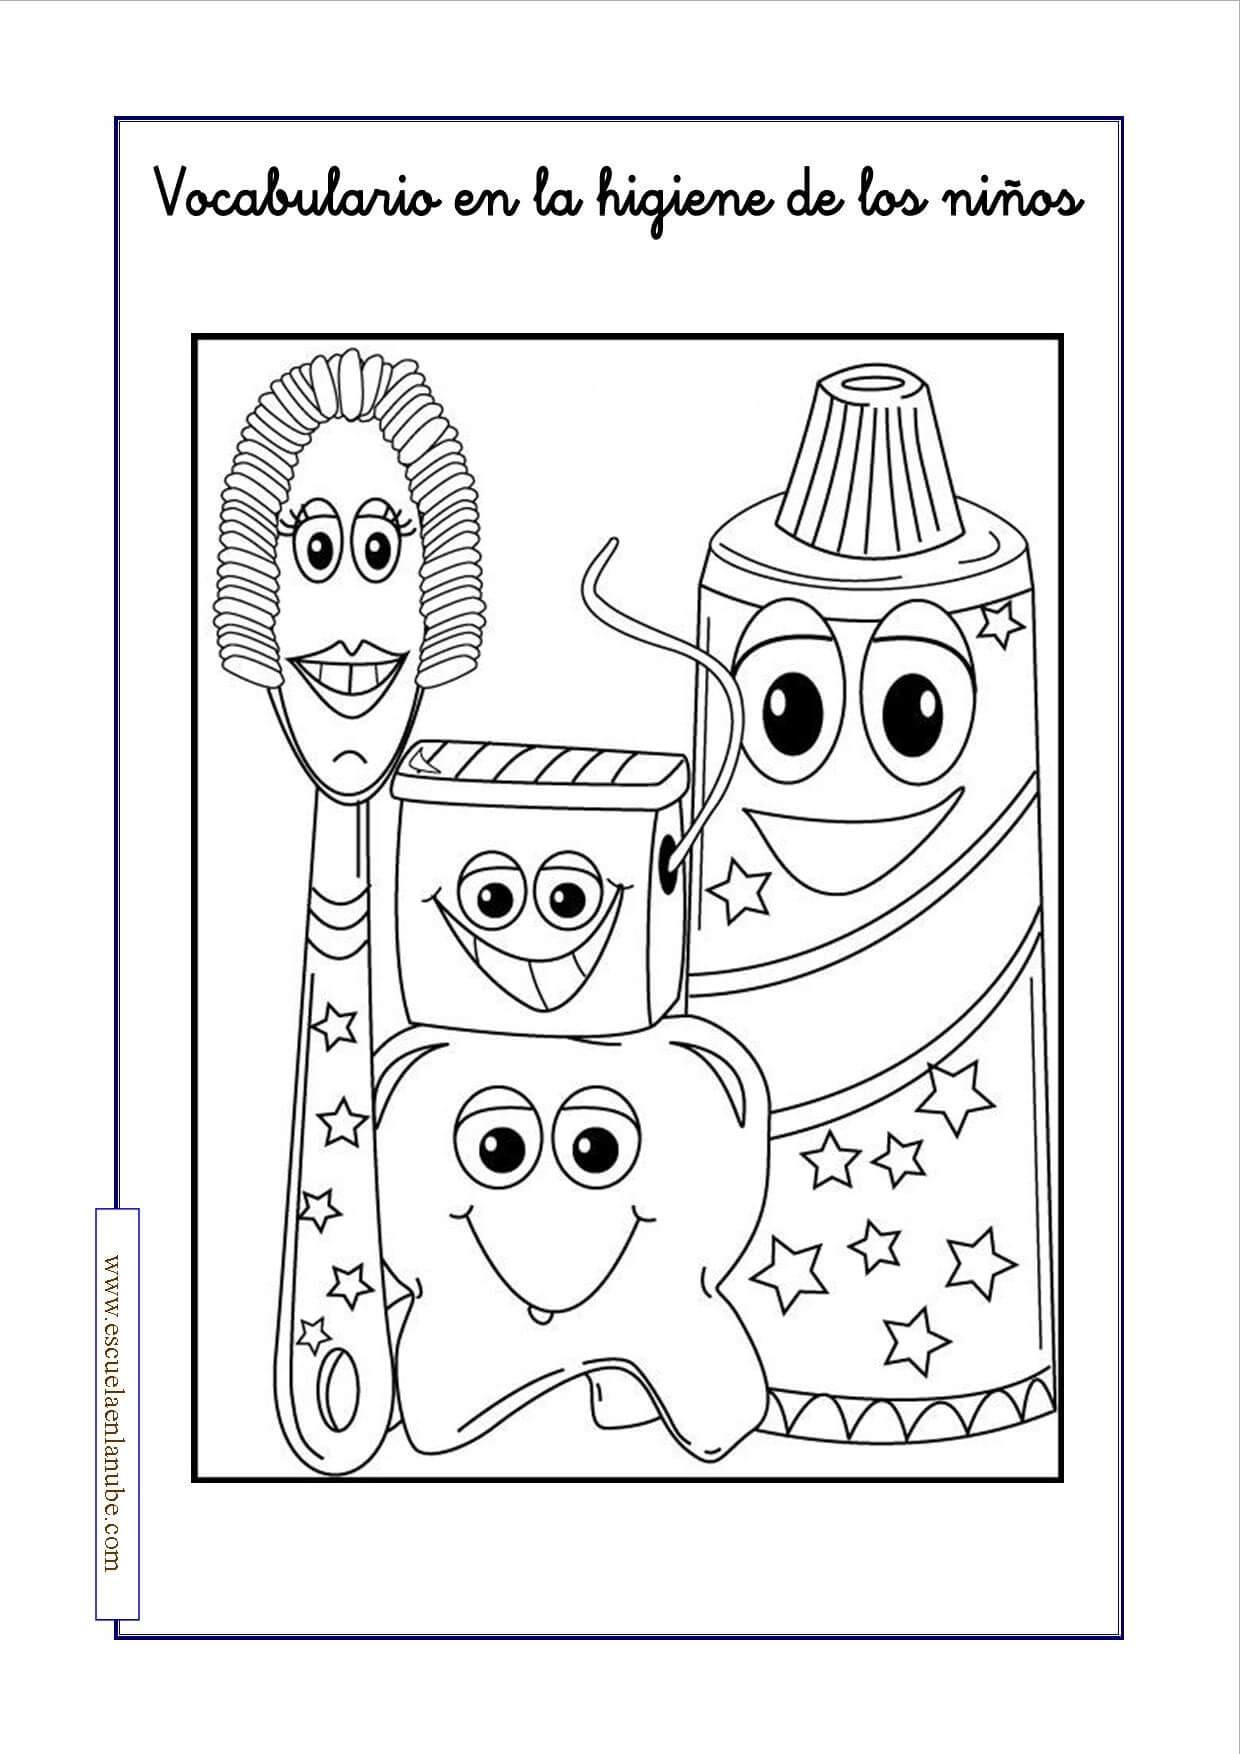 Higiene infantil. Fichas para aprender y colorear